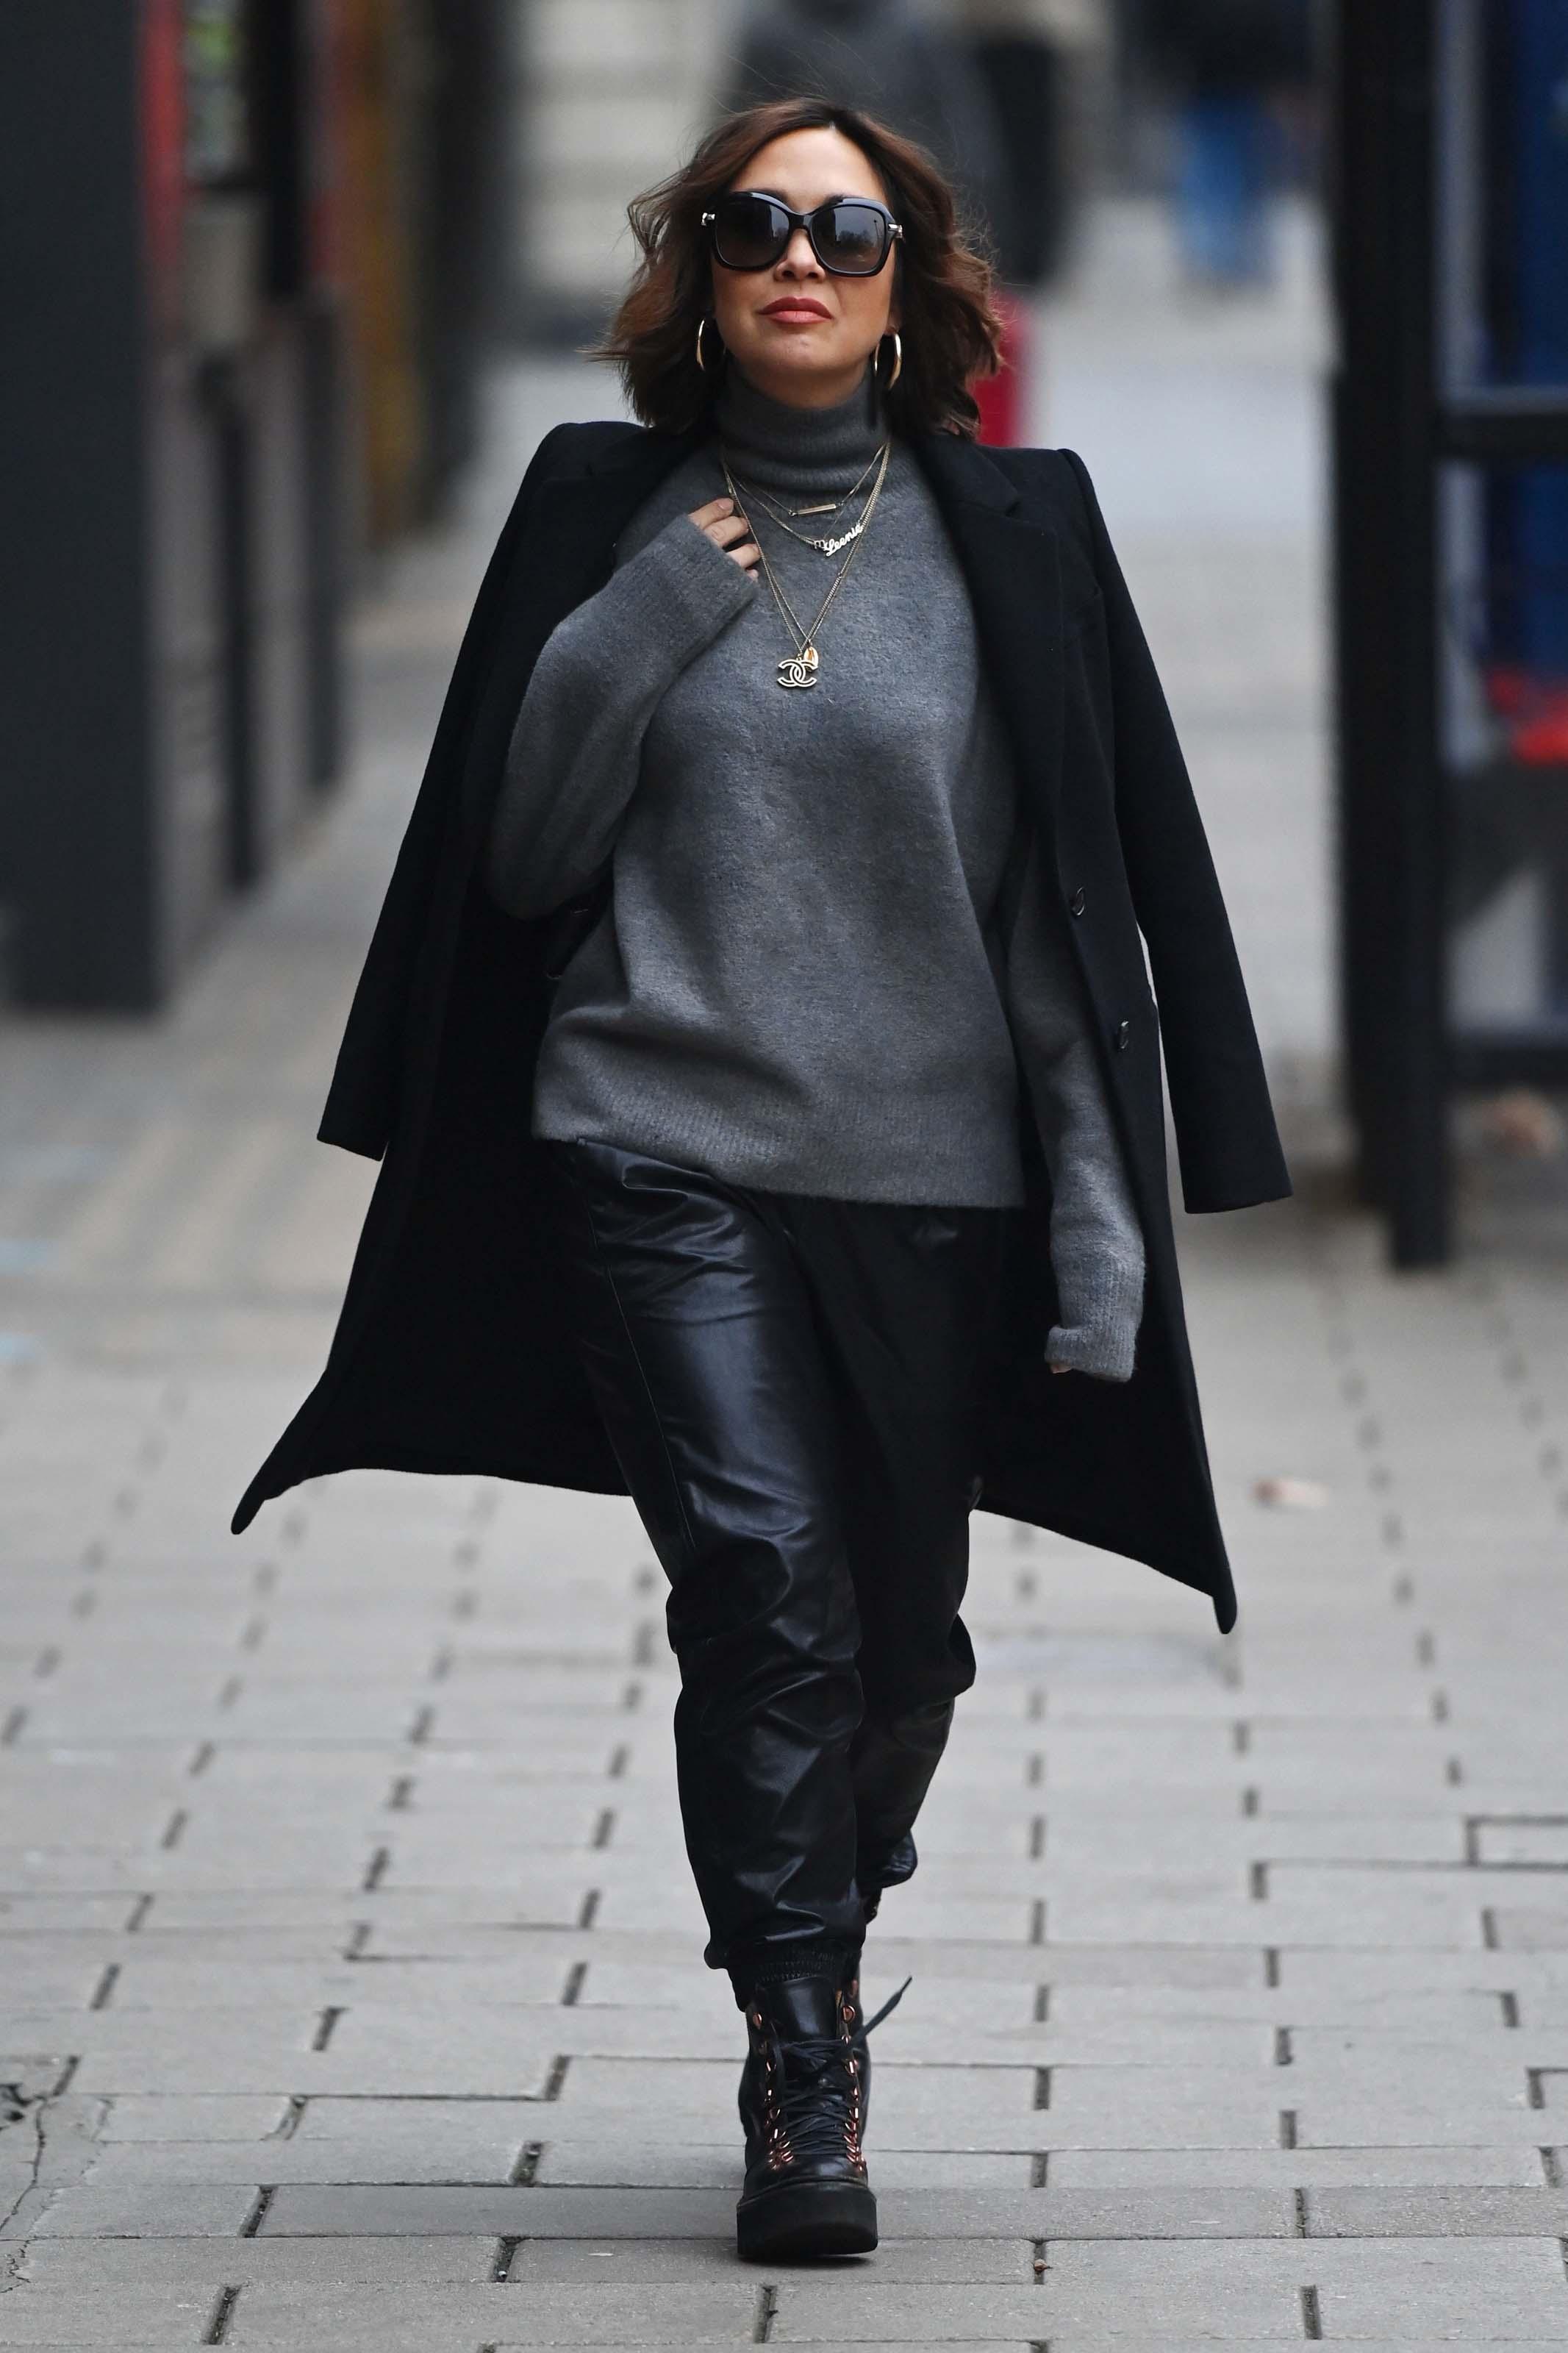 Myleene Klass seen at Global Radio Studios in London